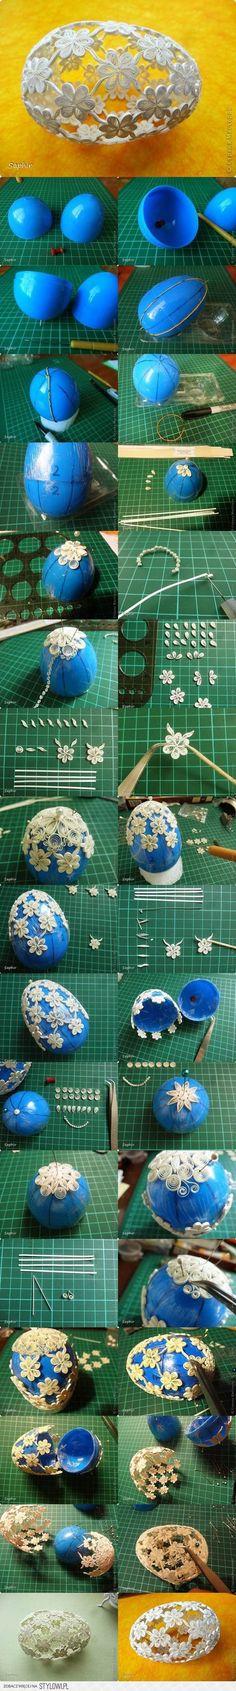 DIY Quilling Flowers Easter Egg | iCreativeIdeas.com